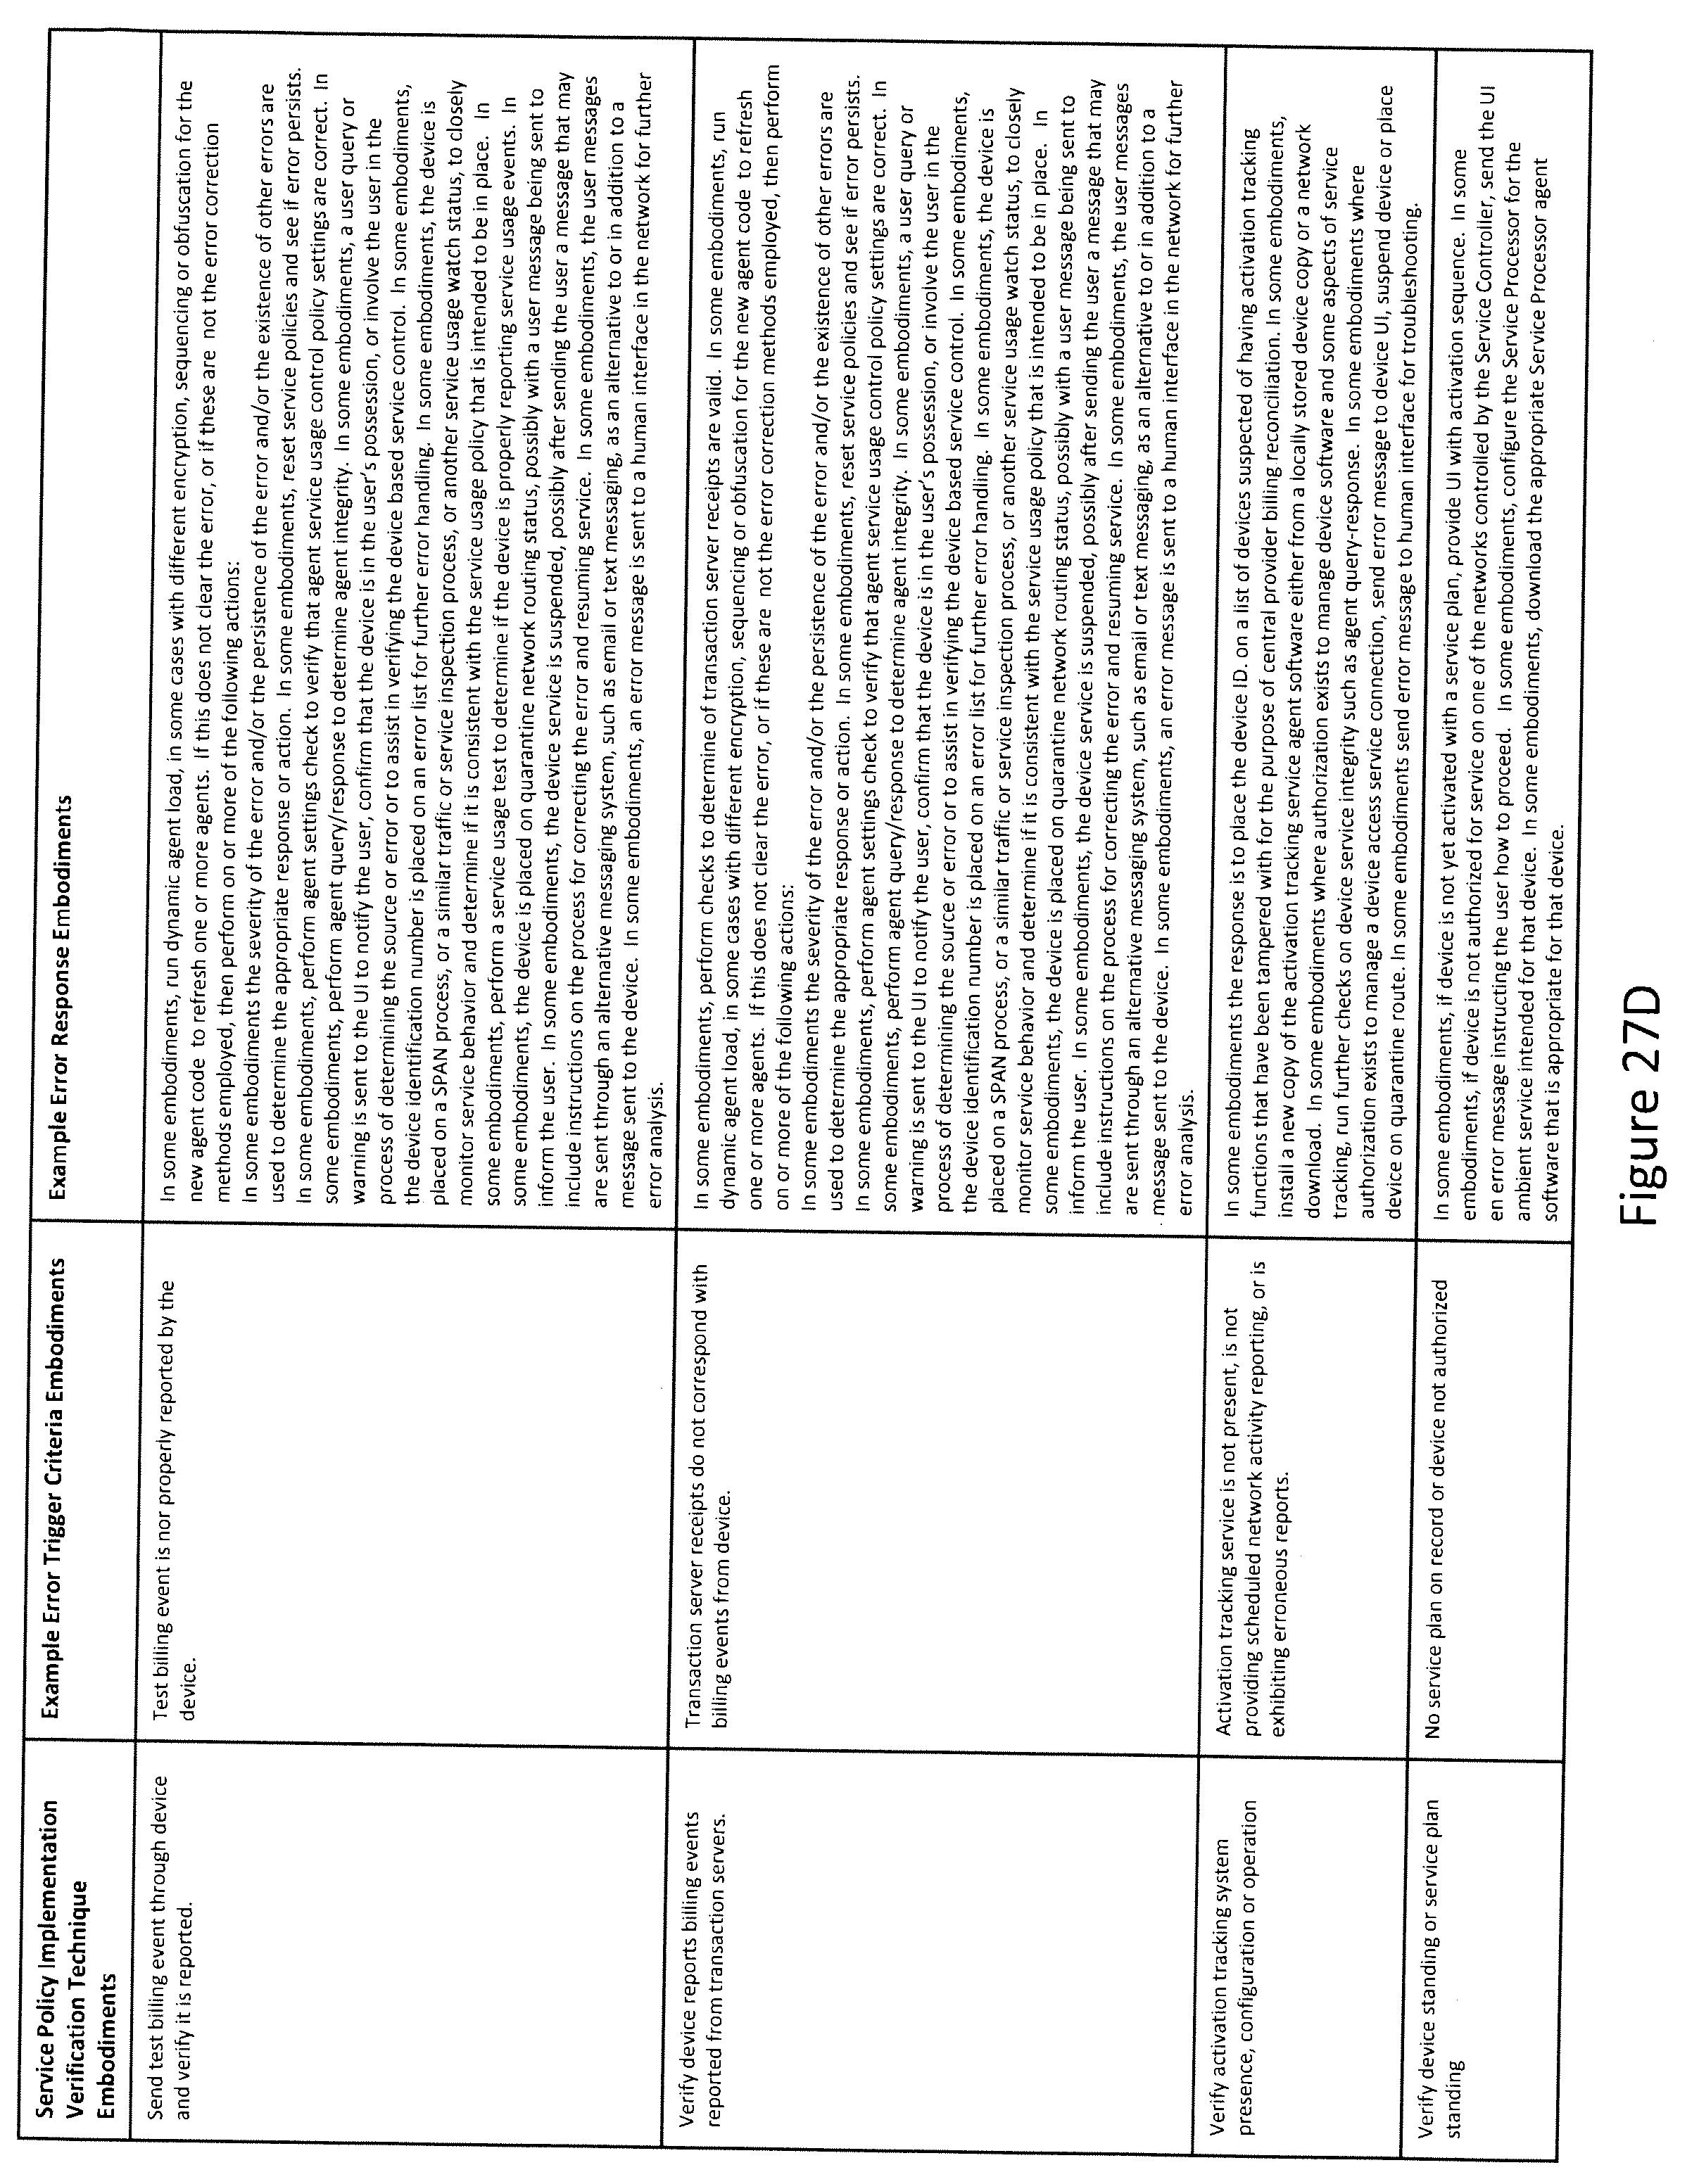 US20120088470A1 - Verifiable device assisted service usage